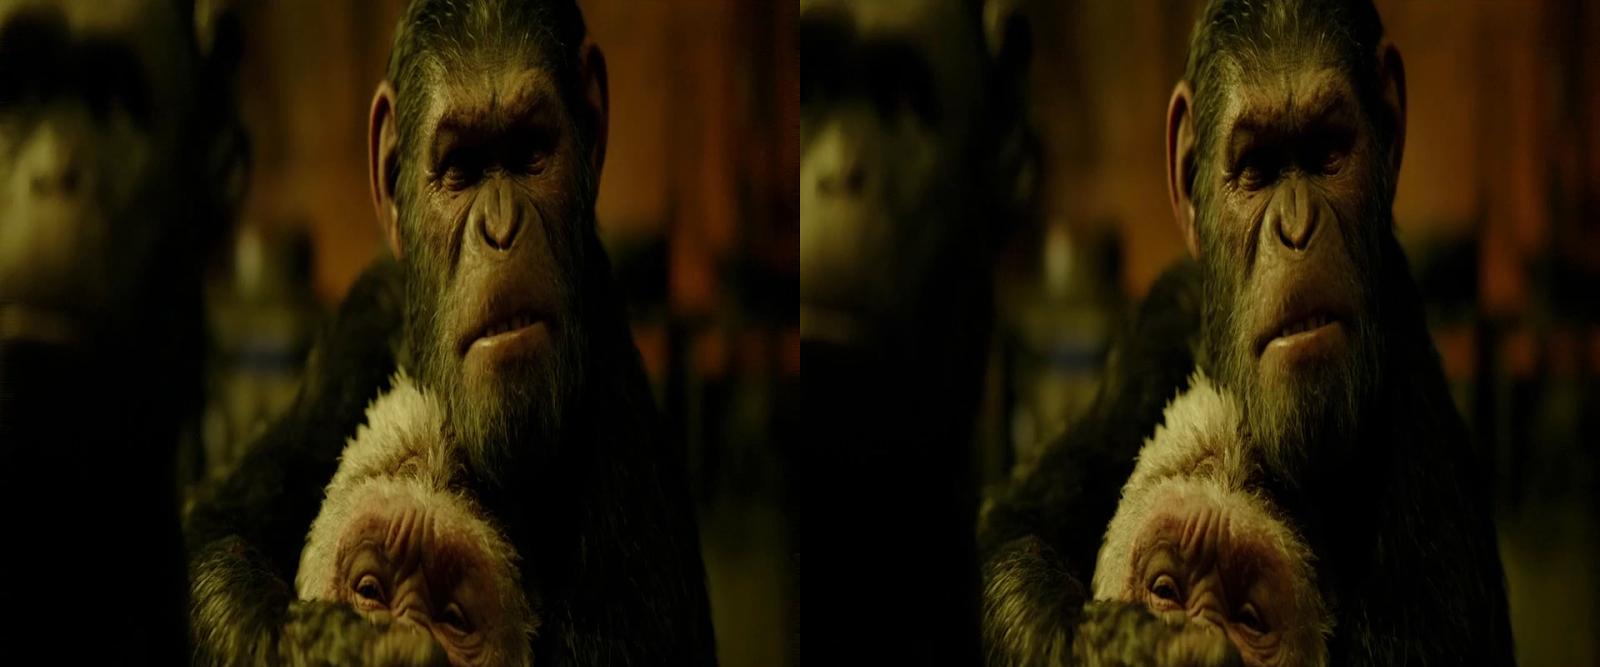 El Planeta de los Simios: La Guerra (2017) 3D SBS 1080p Latino - Ingles captura 2